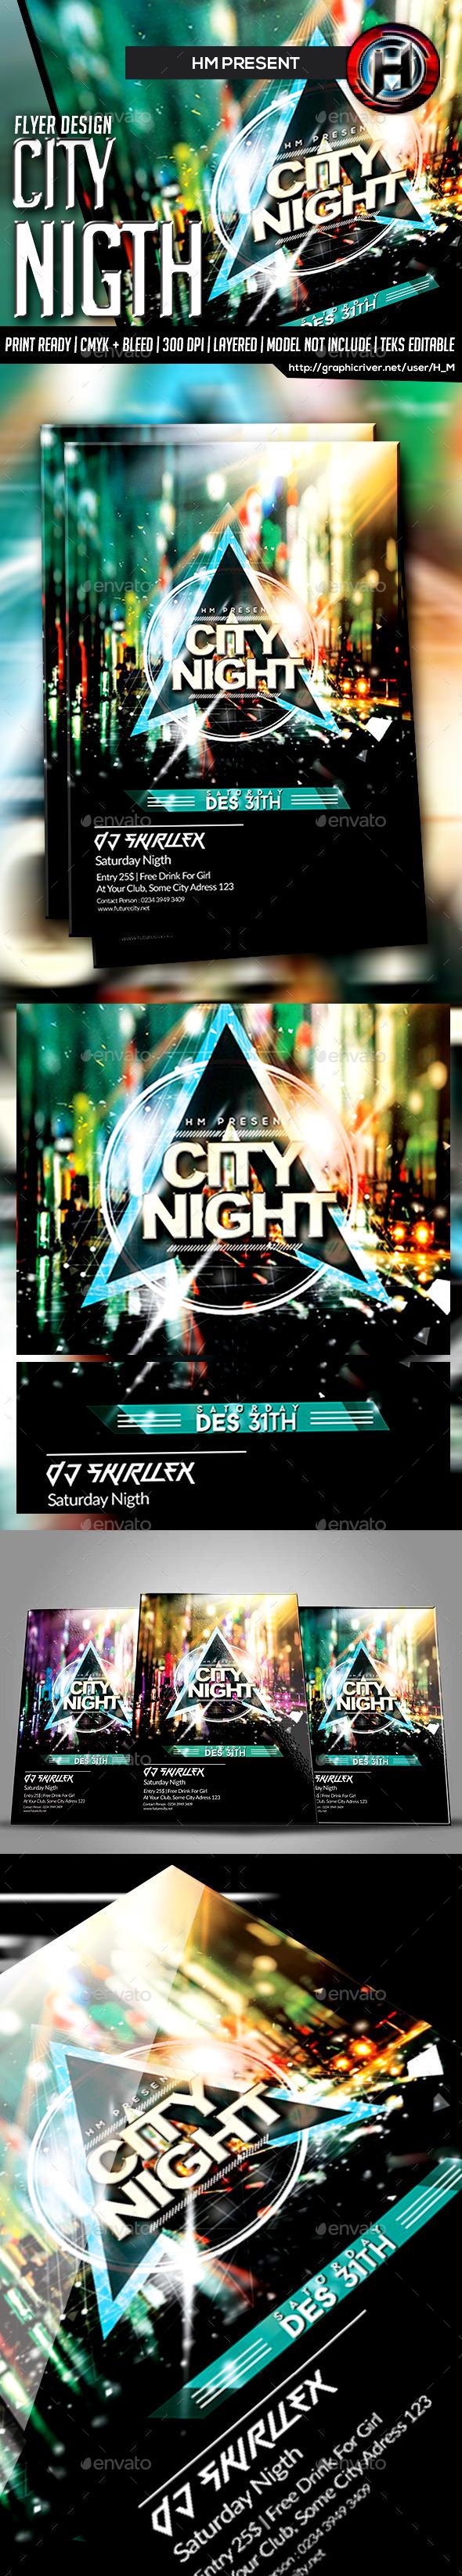 DJ Guest City Futurism Flyer Design - Events Flyers